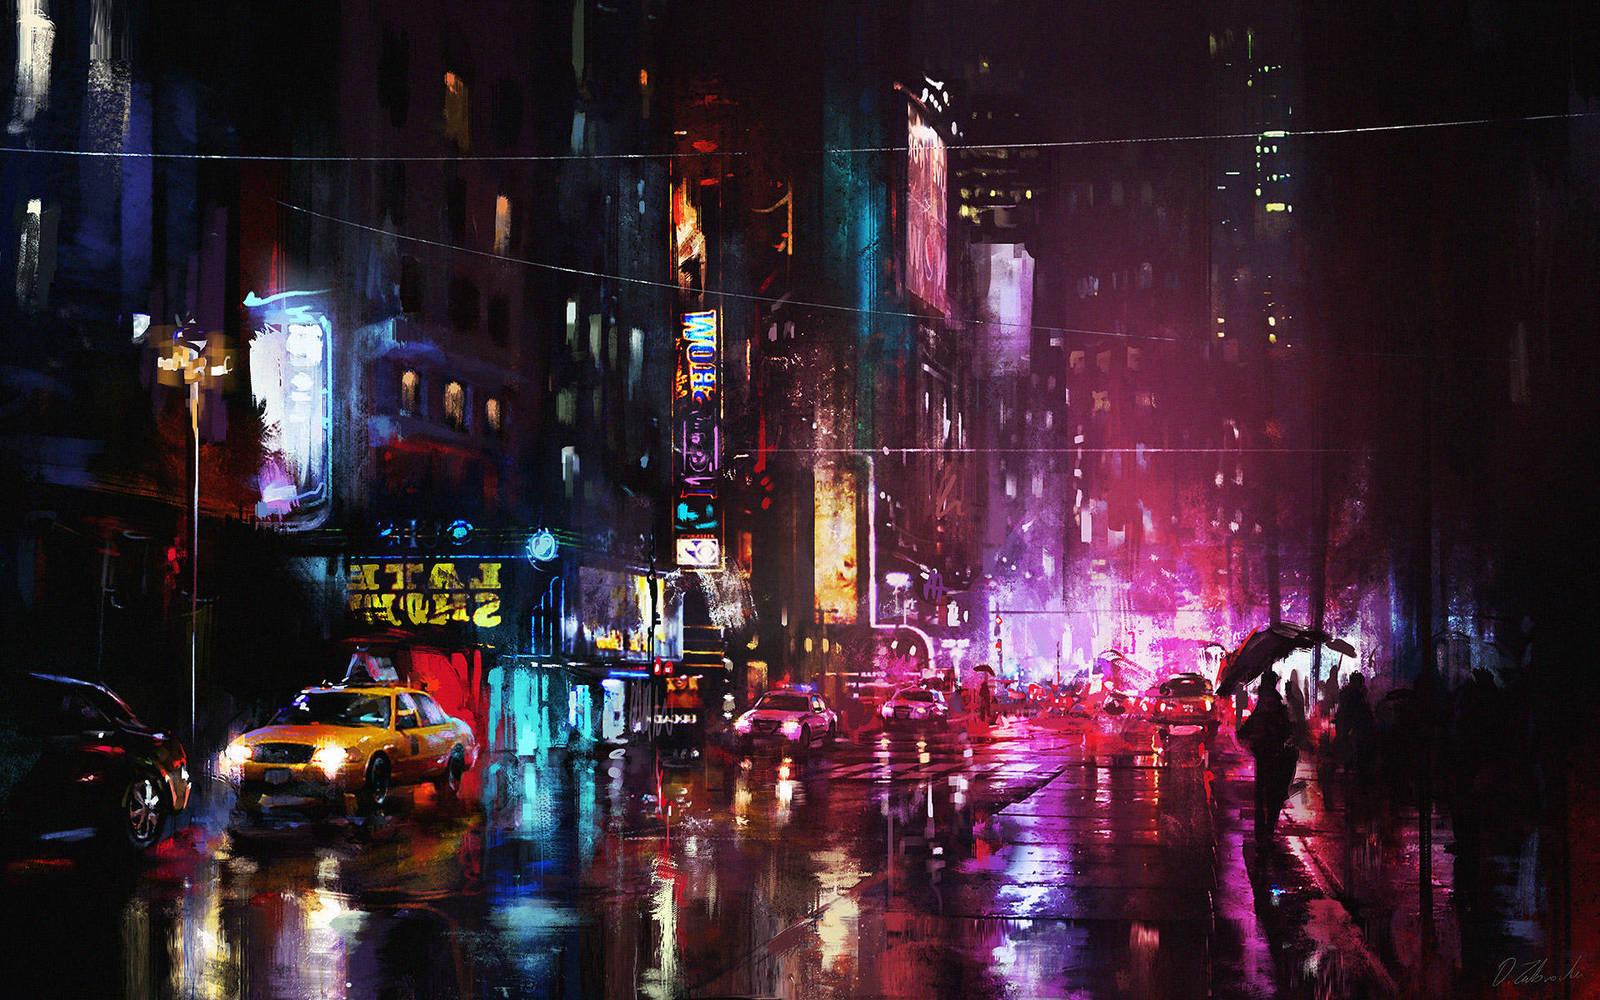 red_lights_by_daroz_d7kuqyu-fullview.jpg